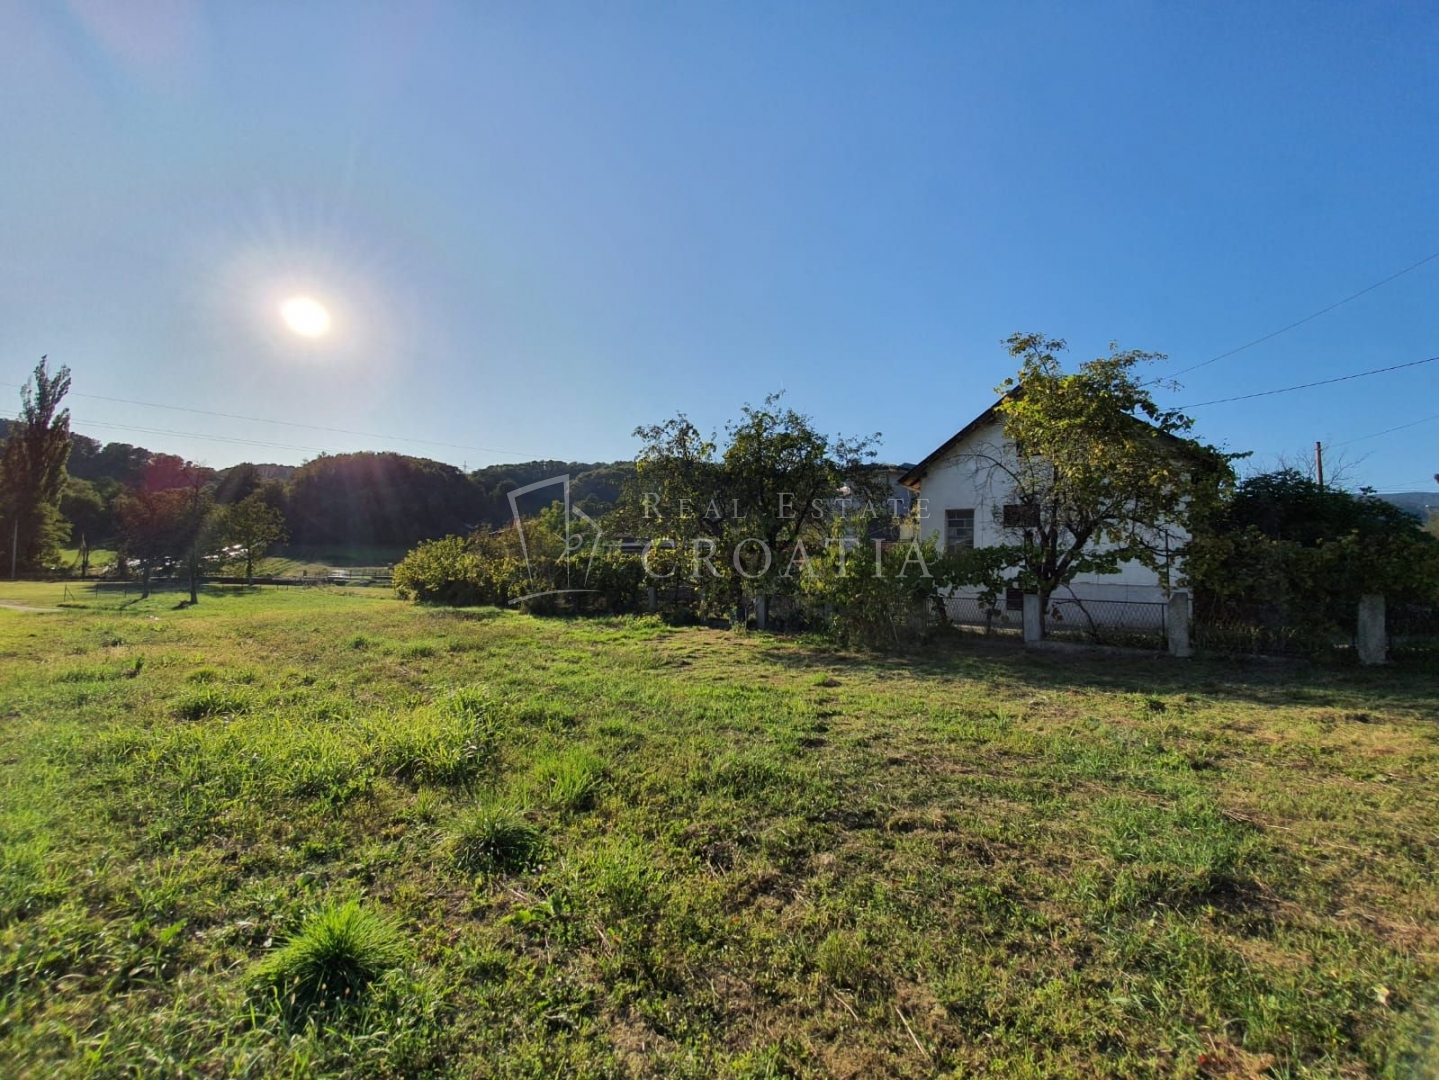 Dubrava-Miroševečka cesta, kuća sa zemljištem